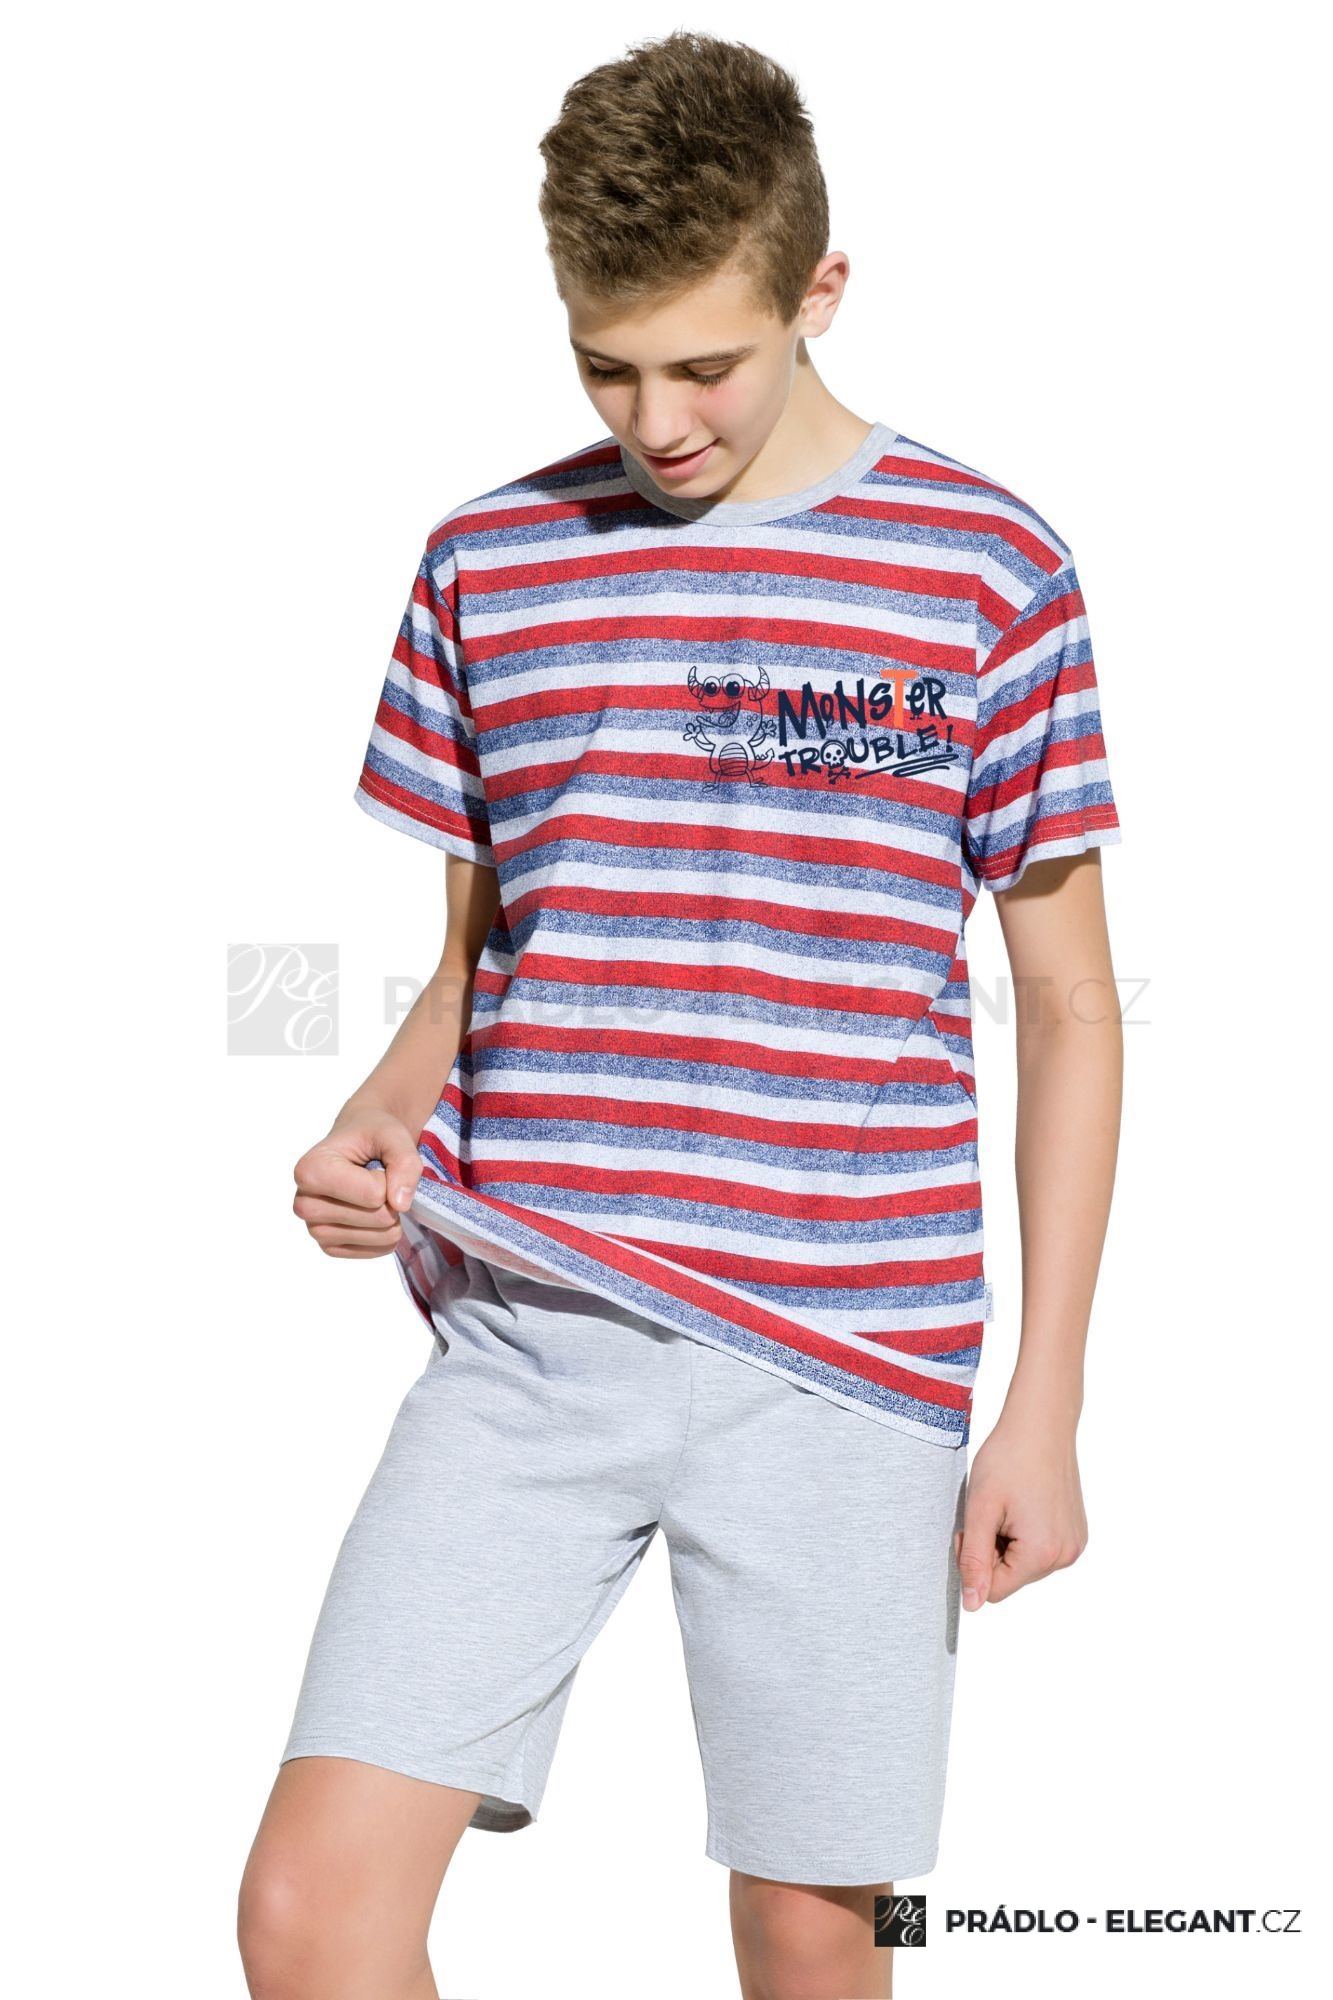 66c73c15b7e5 Chlapecké bavlněné pyžamo Max pruhované - ELEGANT.cz